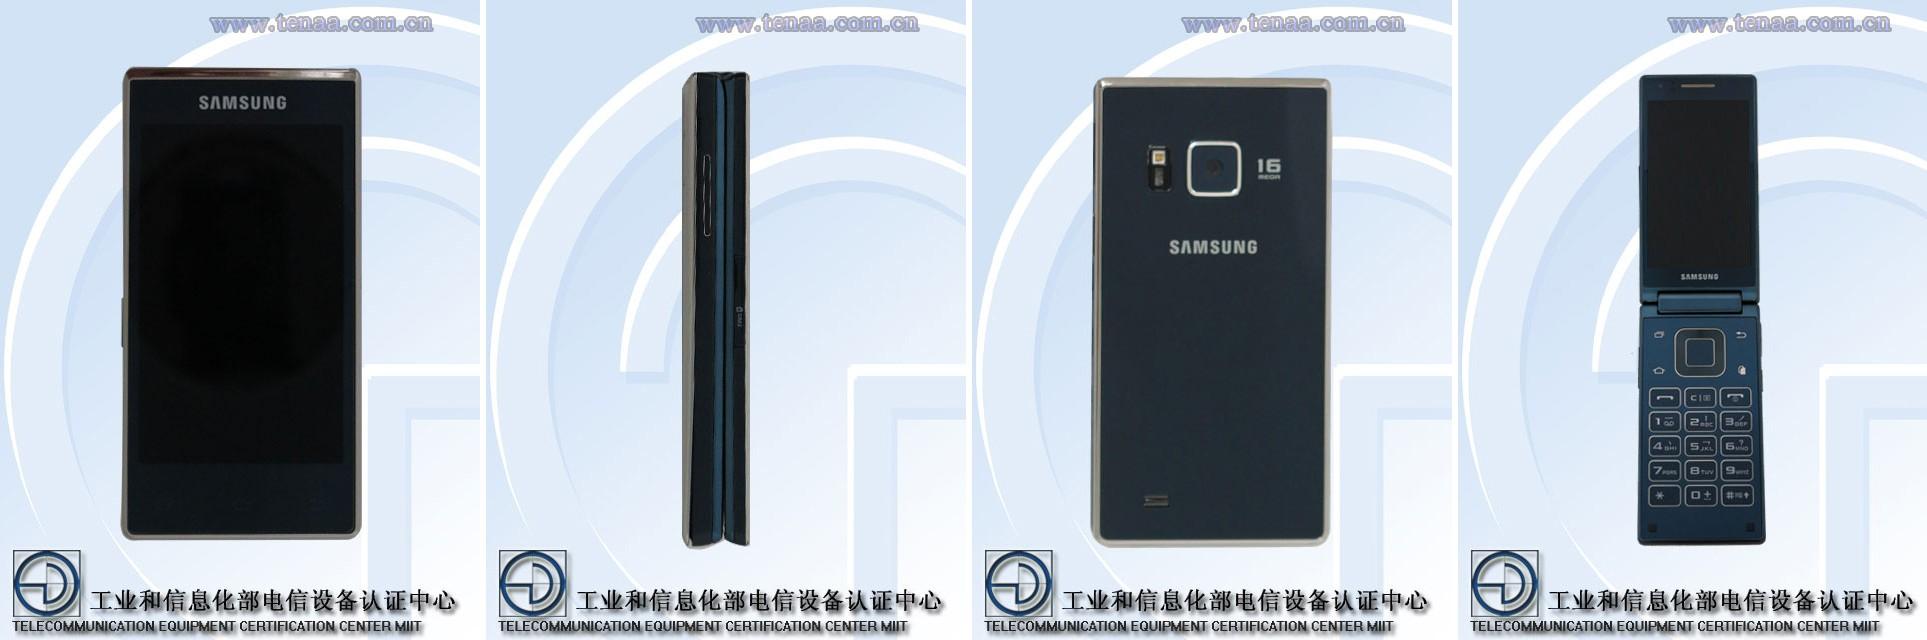 image0191 - Samsung ra mắt điện thoại gập Android với Snapdragon 808